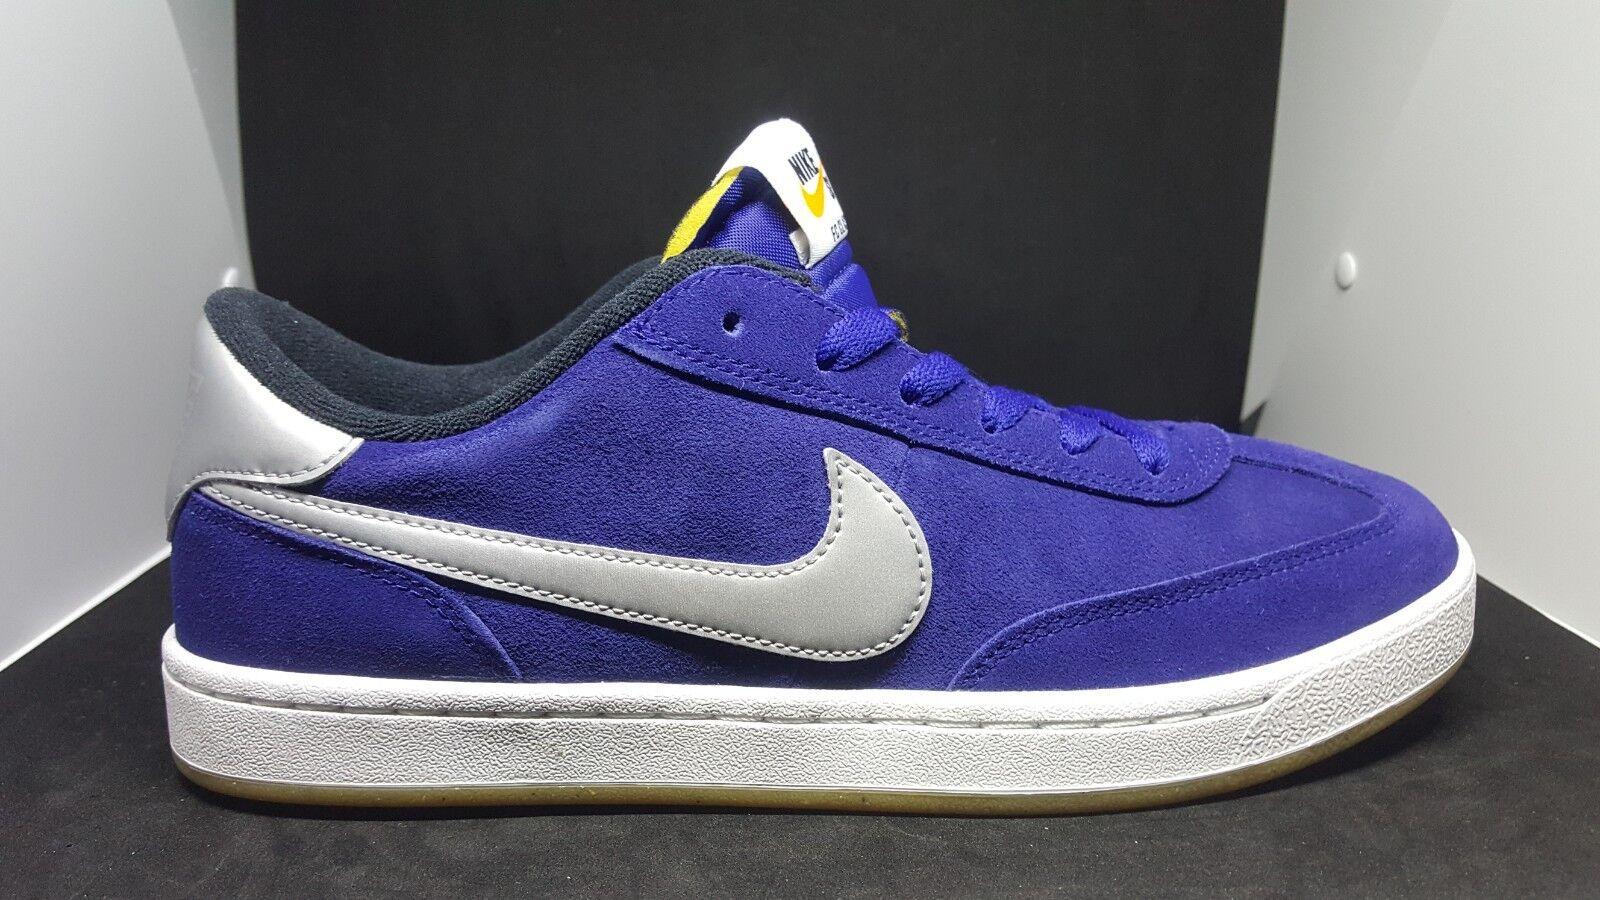 Nike SB FC Classic Mens Size 9 Skateboarding Shoes Blue 909096 401